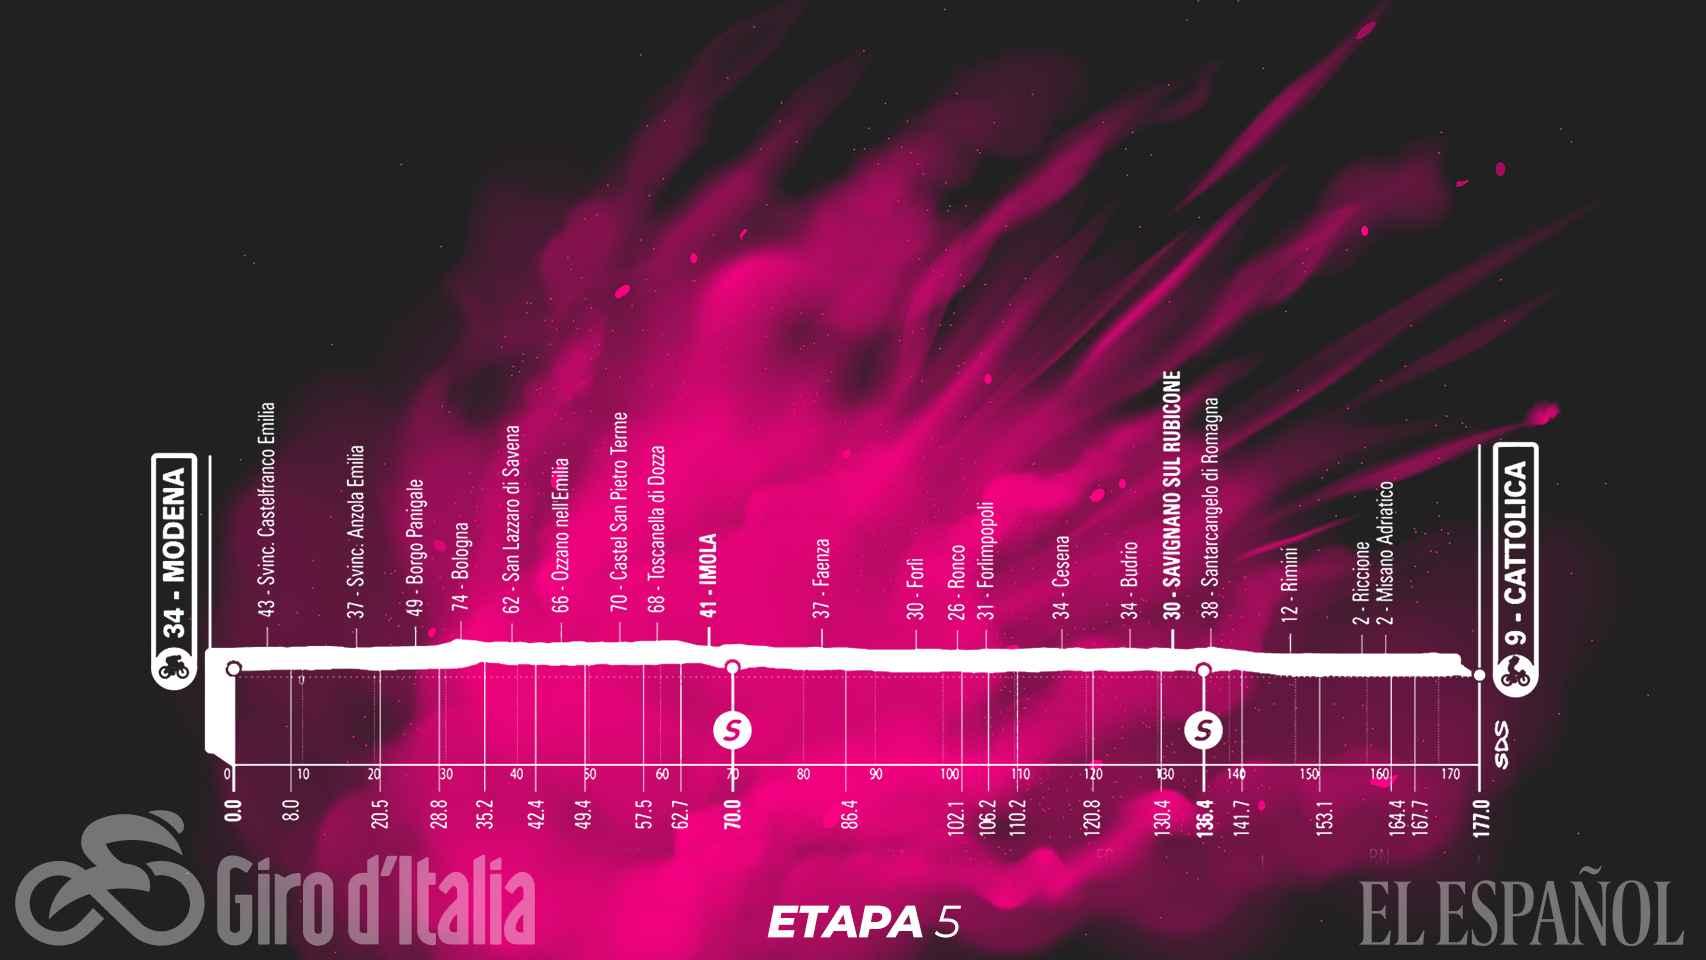 Etapa 5 (miércoles 12 de mayo): Modena - Cattolica | 177 kilómetros